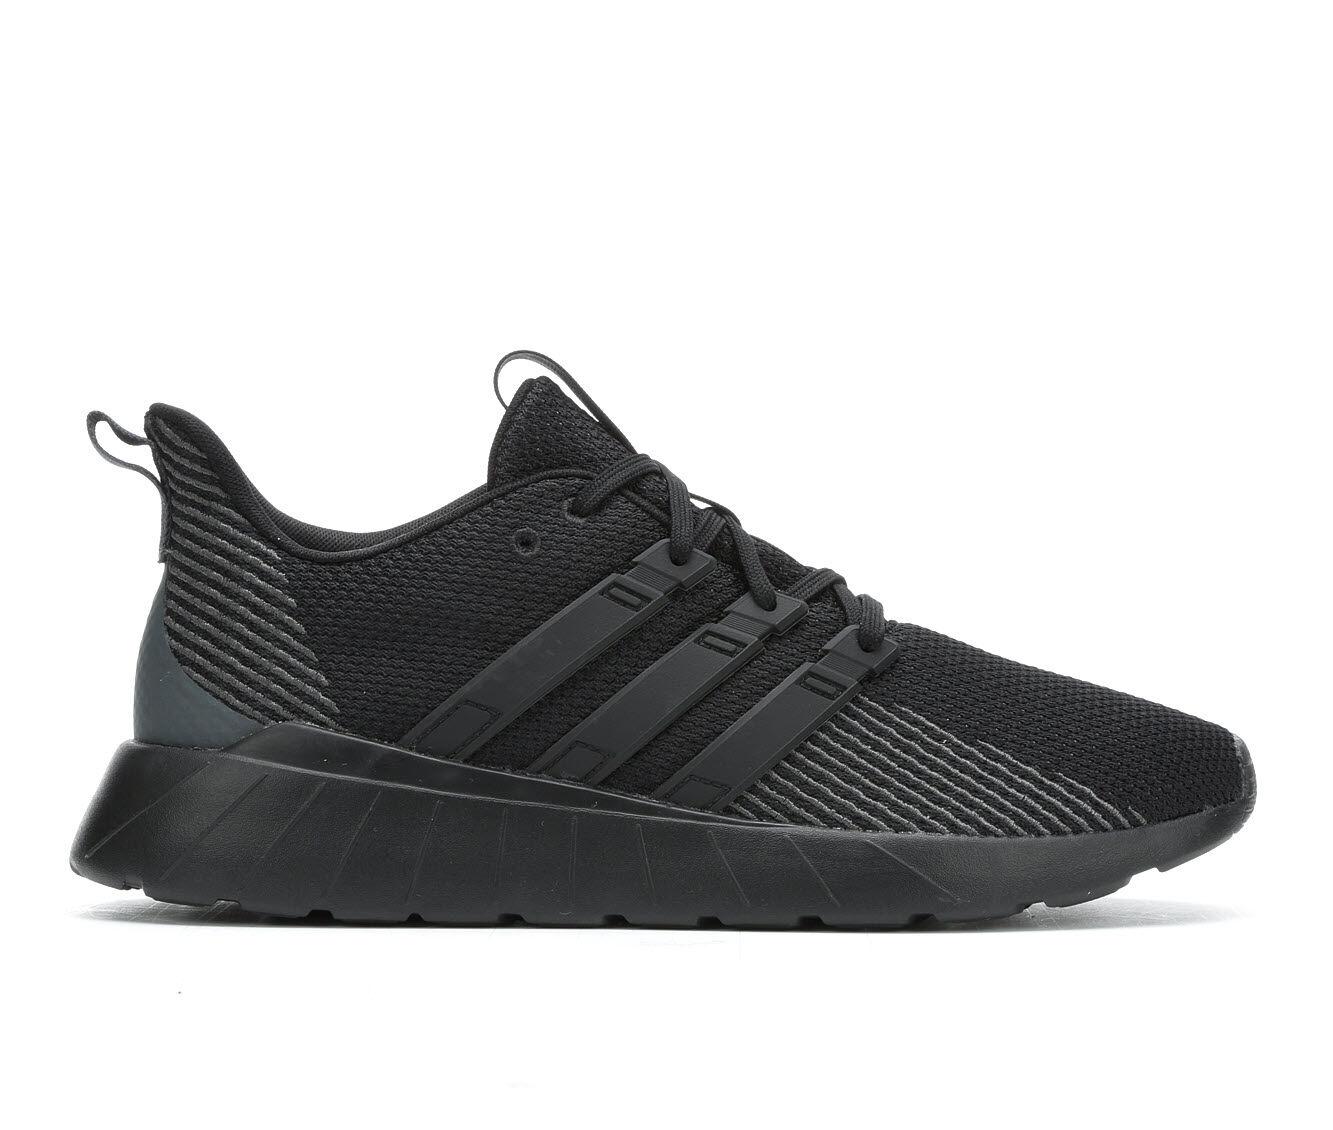 Men's Adidas Questar Flow Running Shoes Blk/Blk/Blk